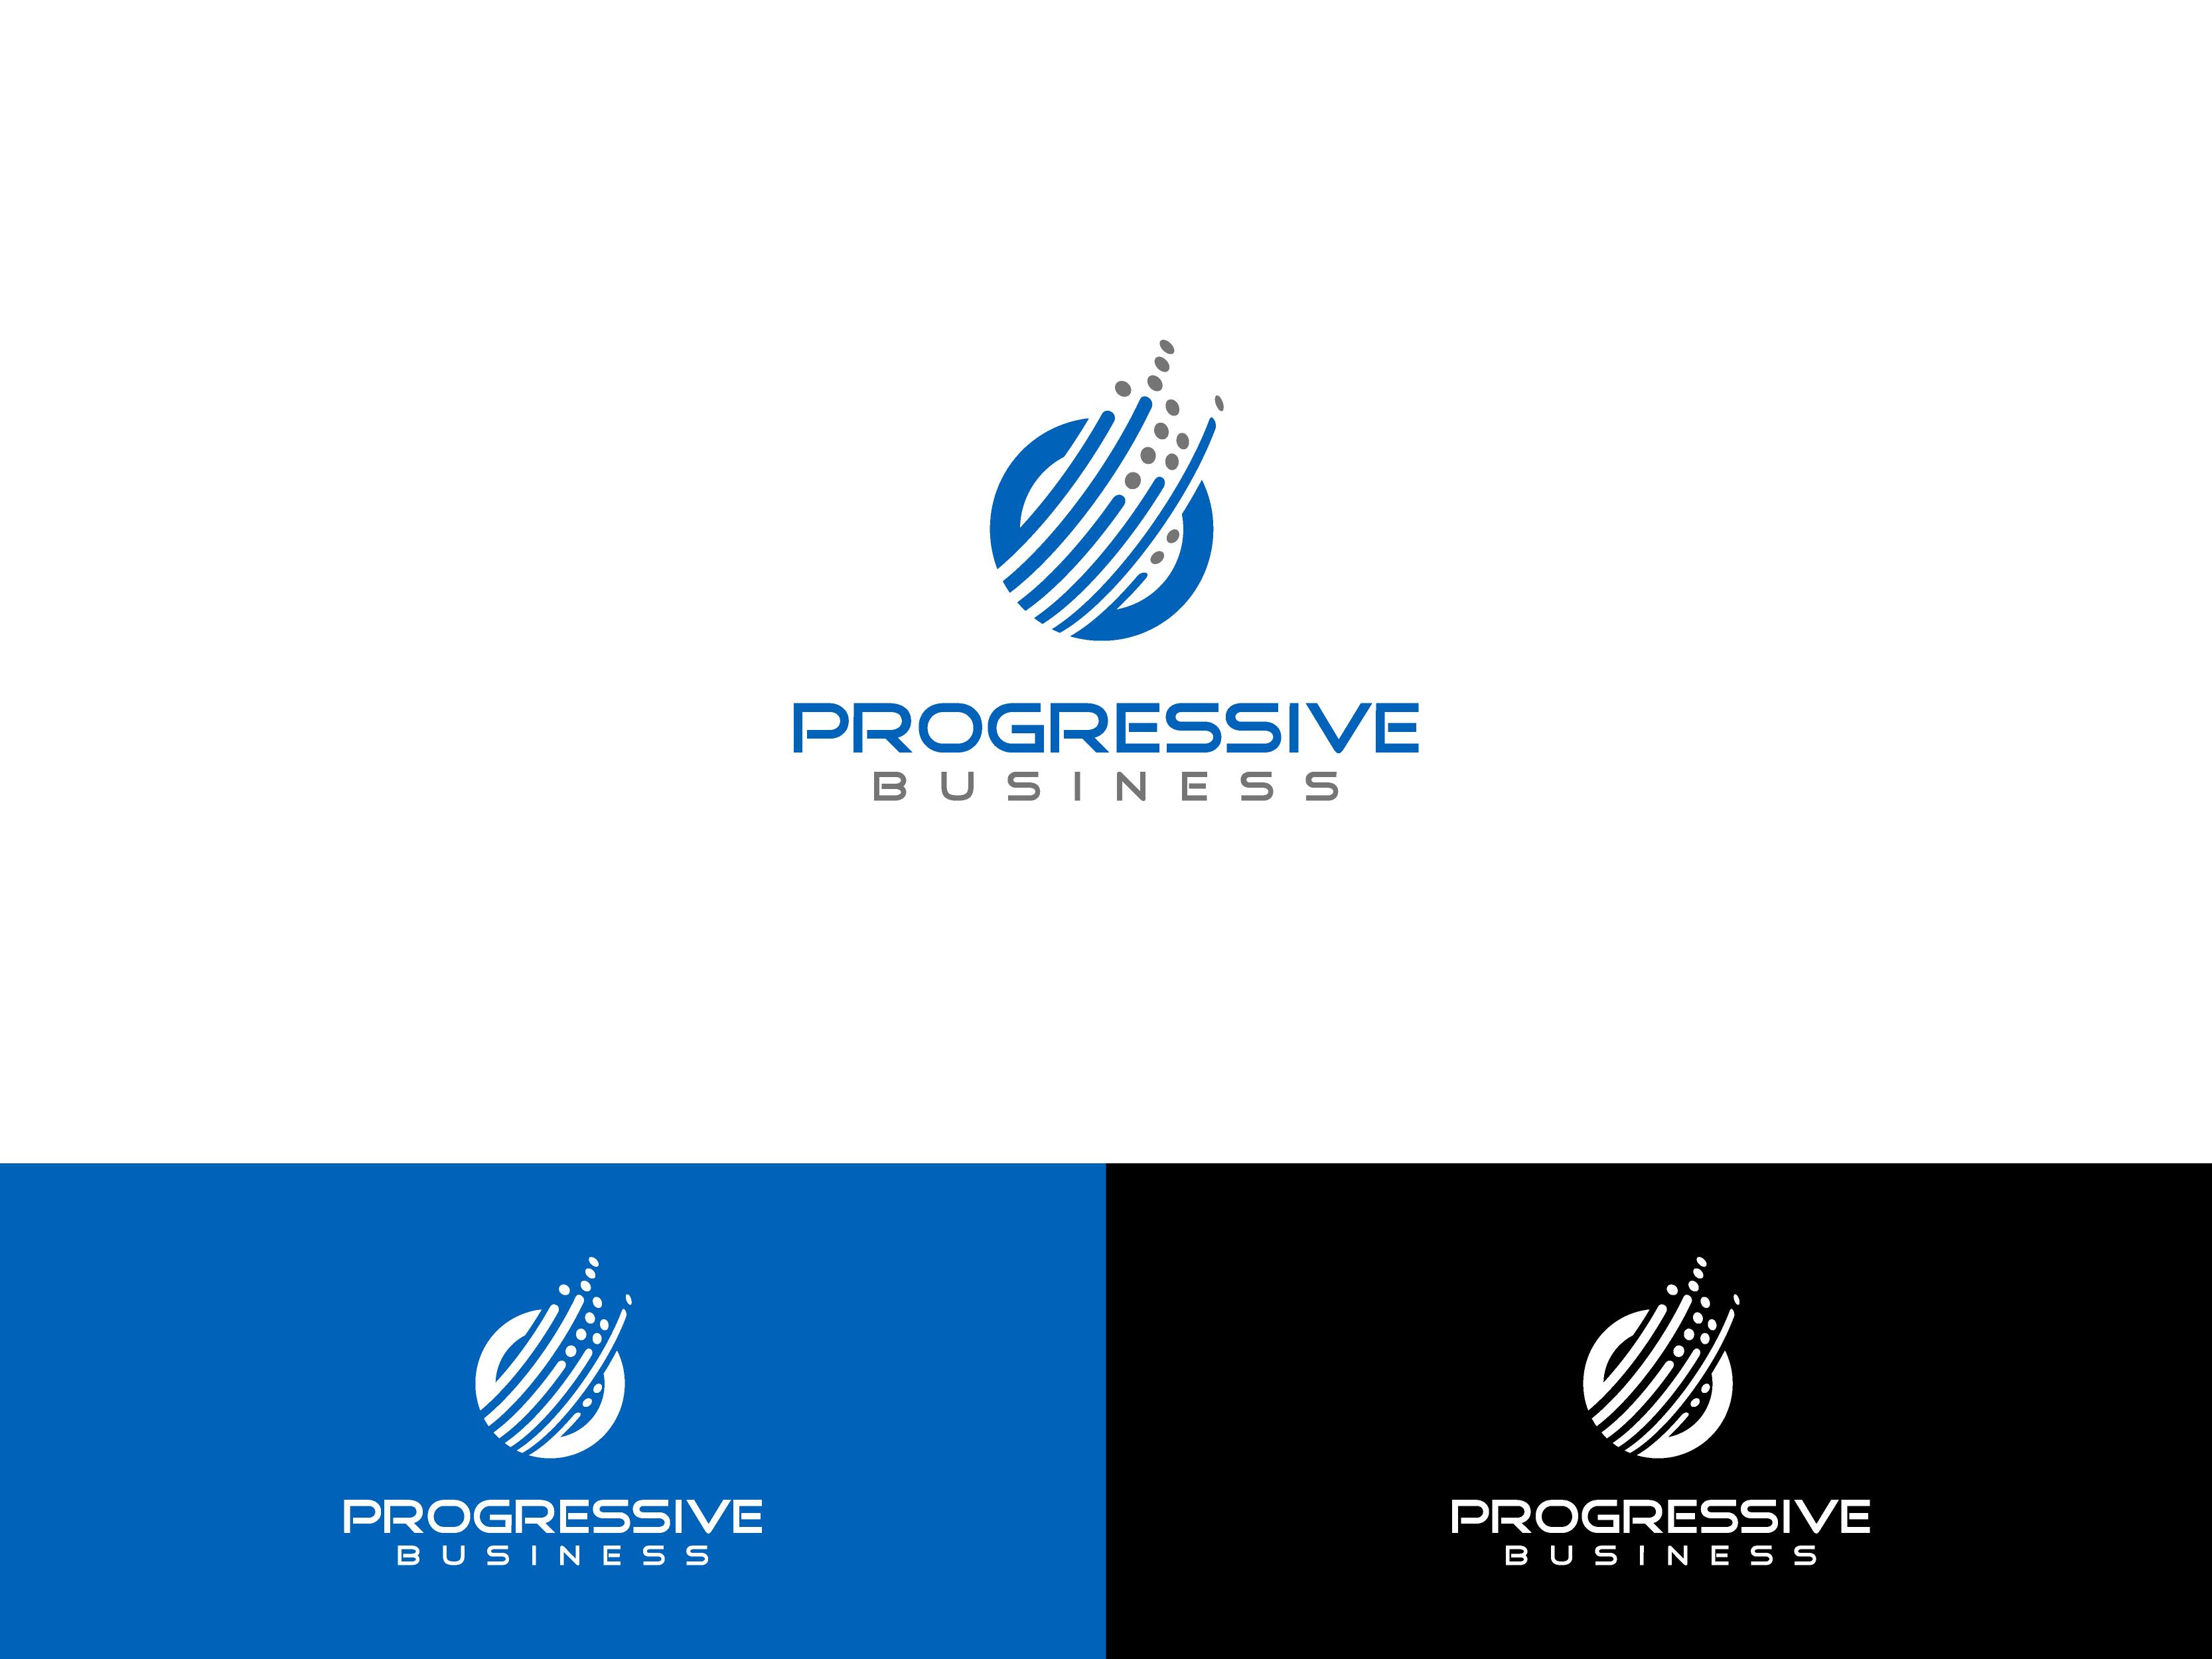 Logo Design by Shivaprasad Sangondimath - Entry No. 180 in the Logo Design Contest Captivating Logo Design for Progressive Business.